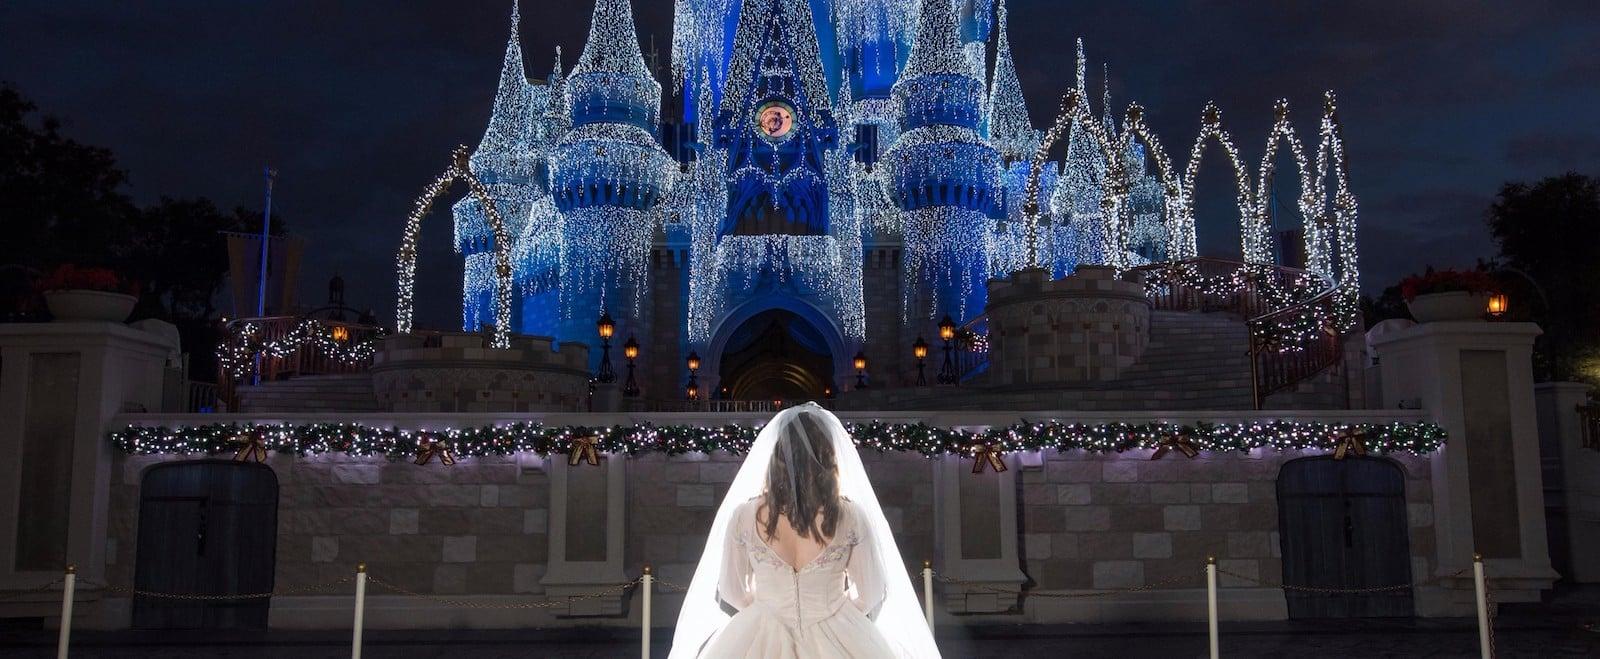 Disney Fairy Tale Wedding Shoot at Magic Kingdom